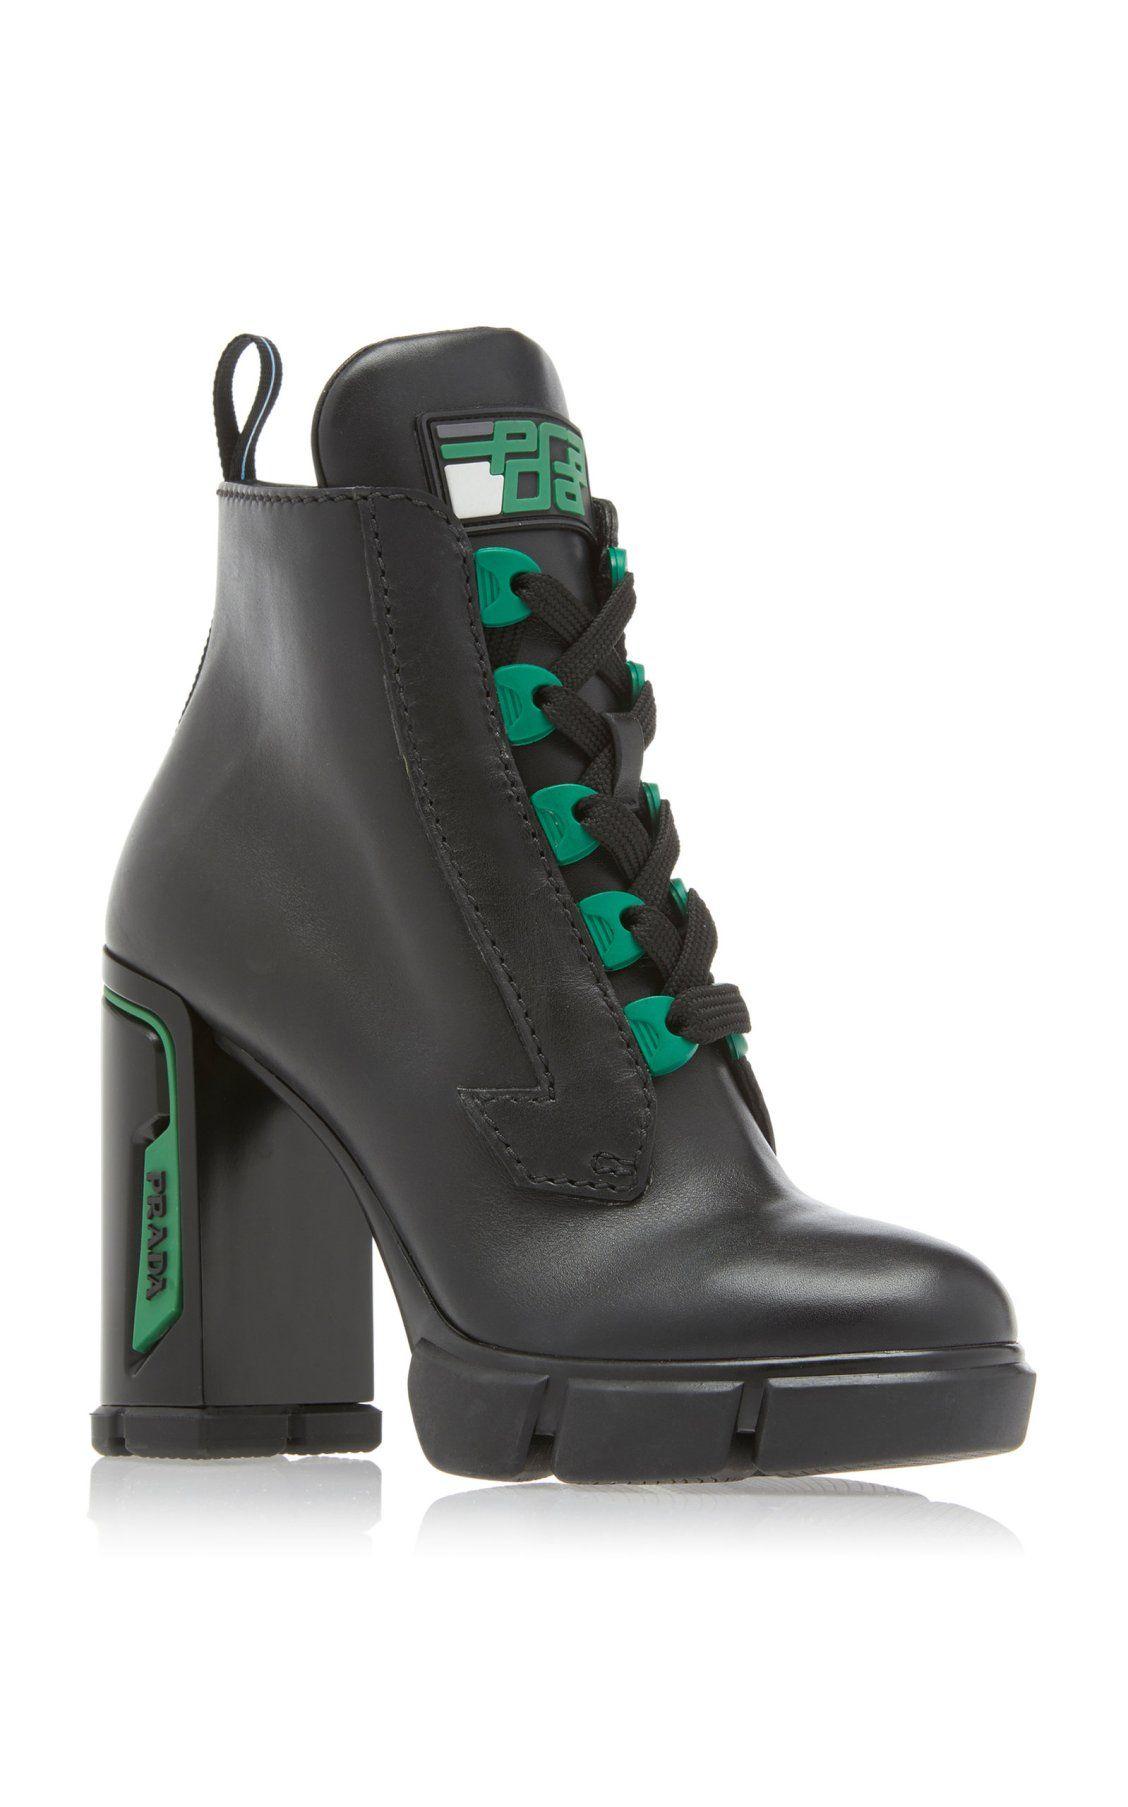 746d6f4469 Tronchetti Leather Ankle Boots by Prada | Moda Operandi ...